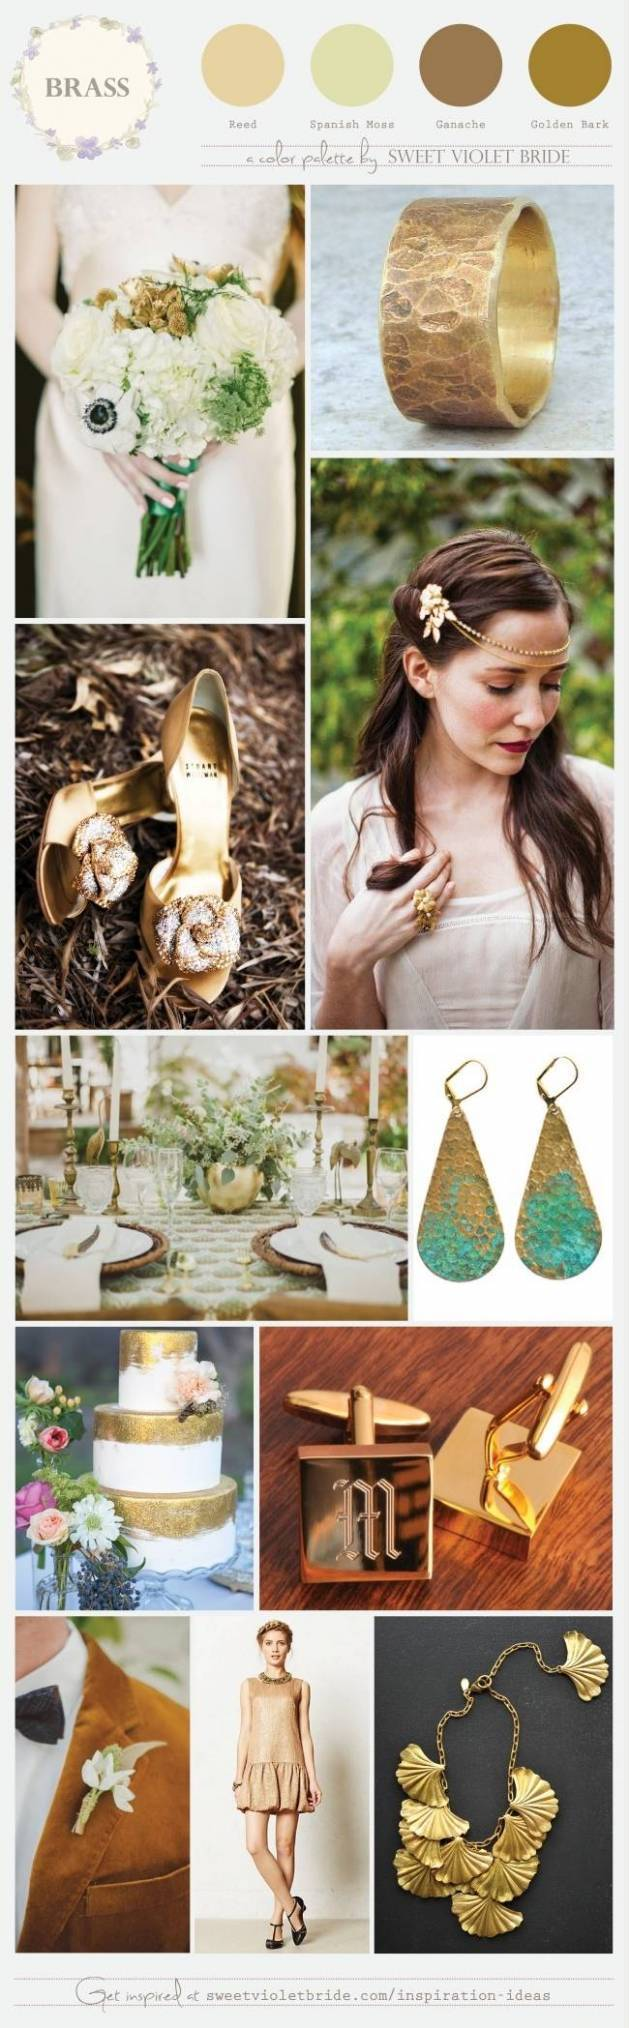 Wedding Color Palette: Brass